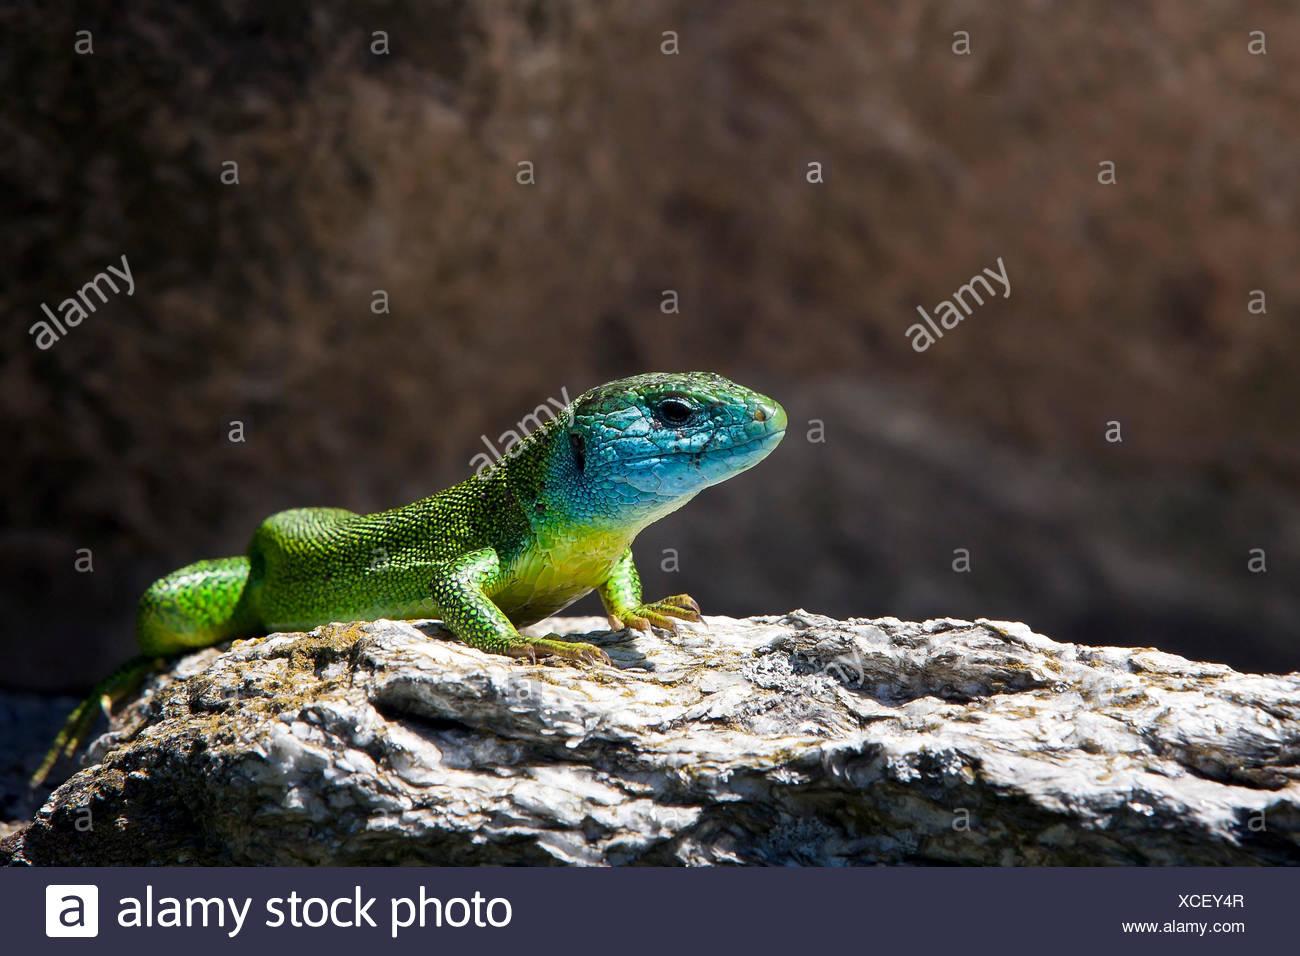 The European Green Lizard (Lacerta viridis) is a large lizard distributed across European midlatitudes, It is often seen sunning on rocks or lawns, or sheltering amongst bushes, Switzerland Europe Stock Photo